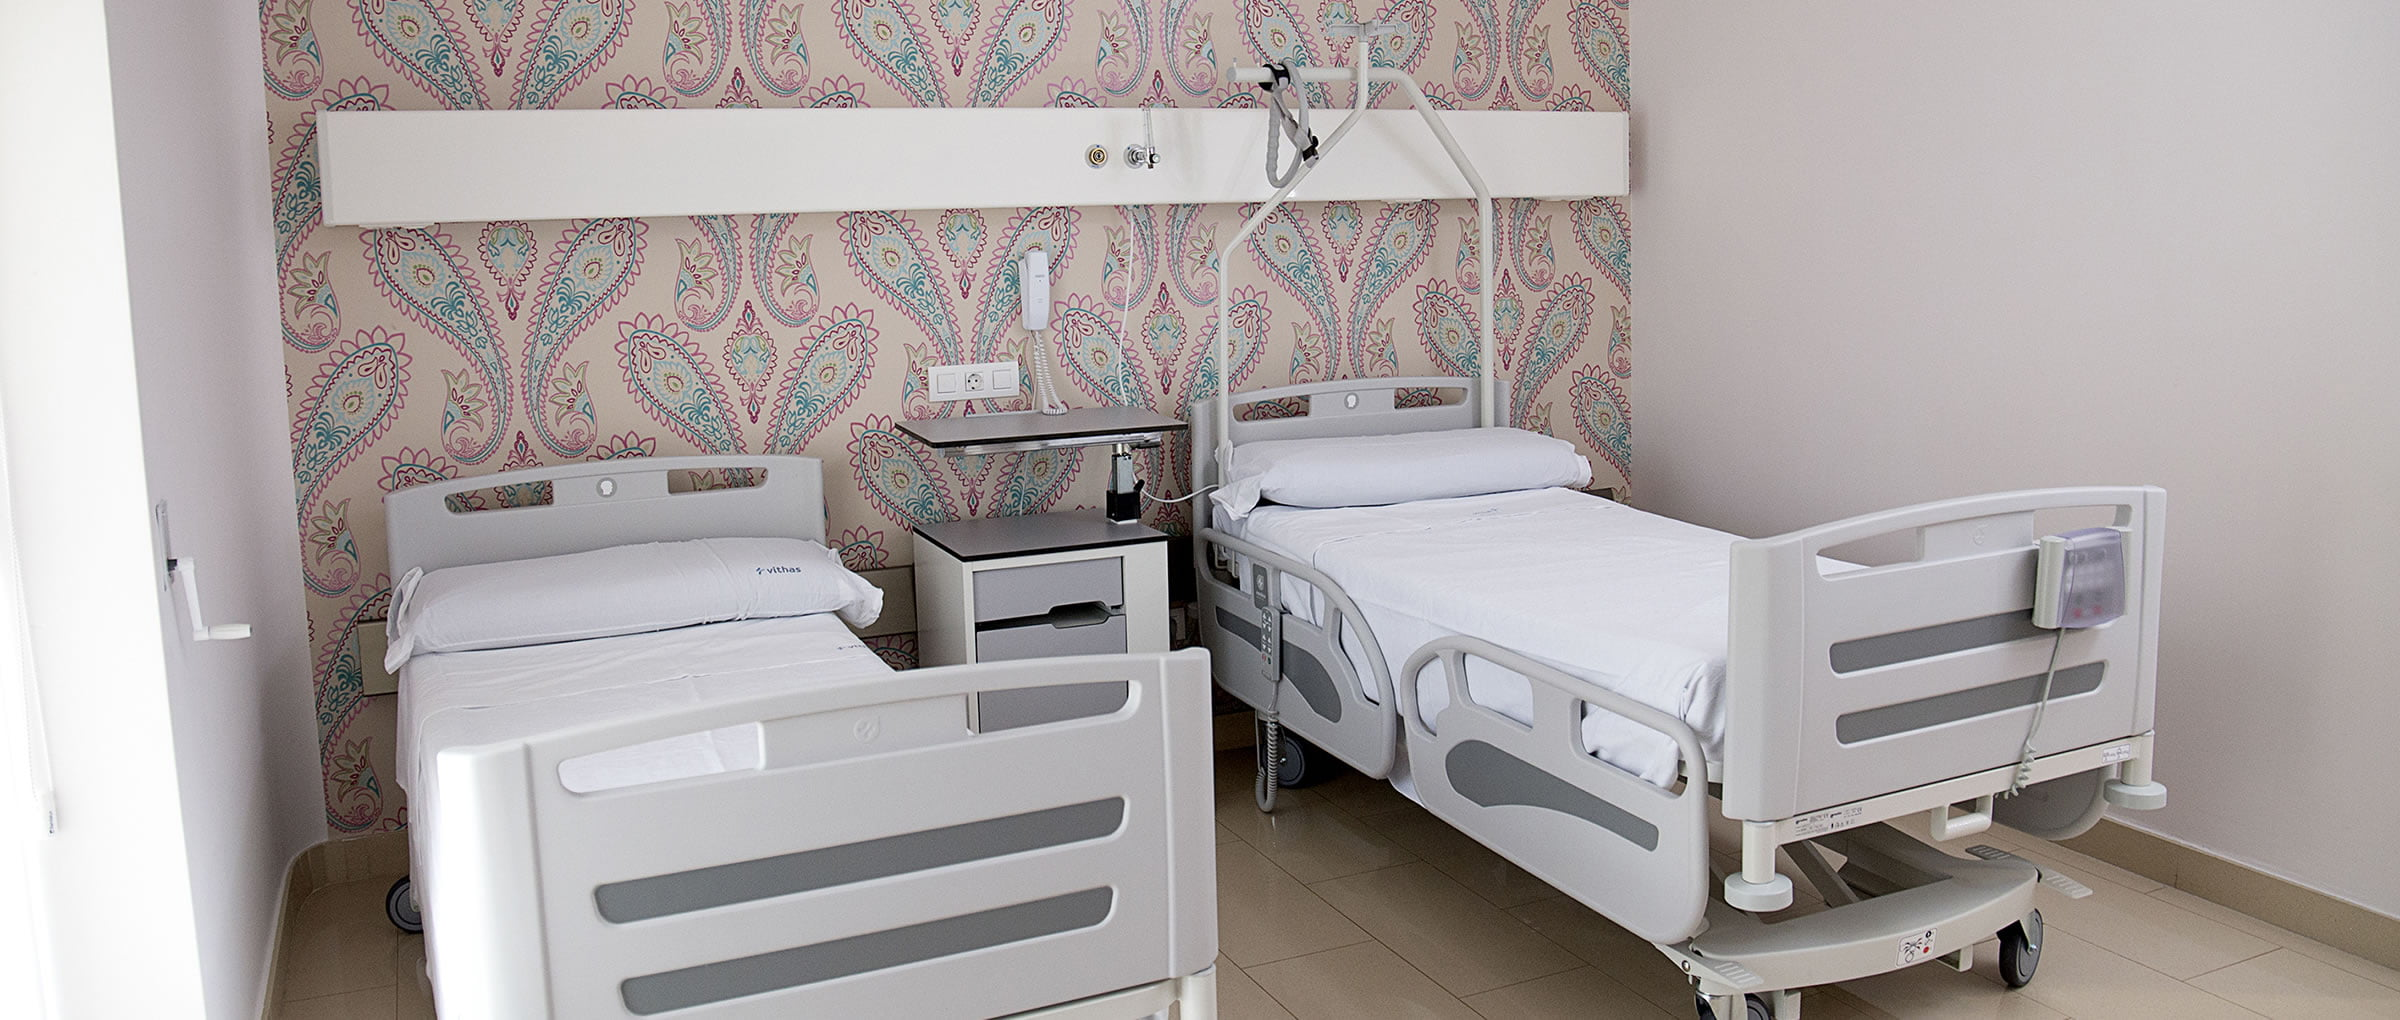 Unidad Phi Fertility Center habitacion